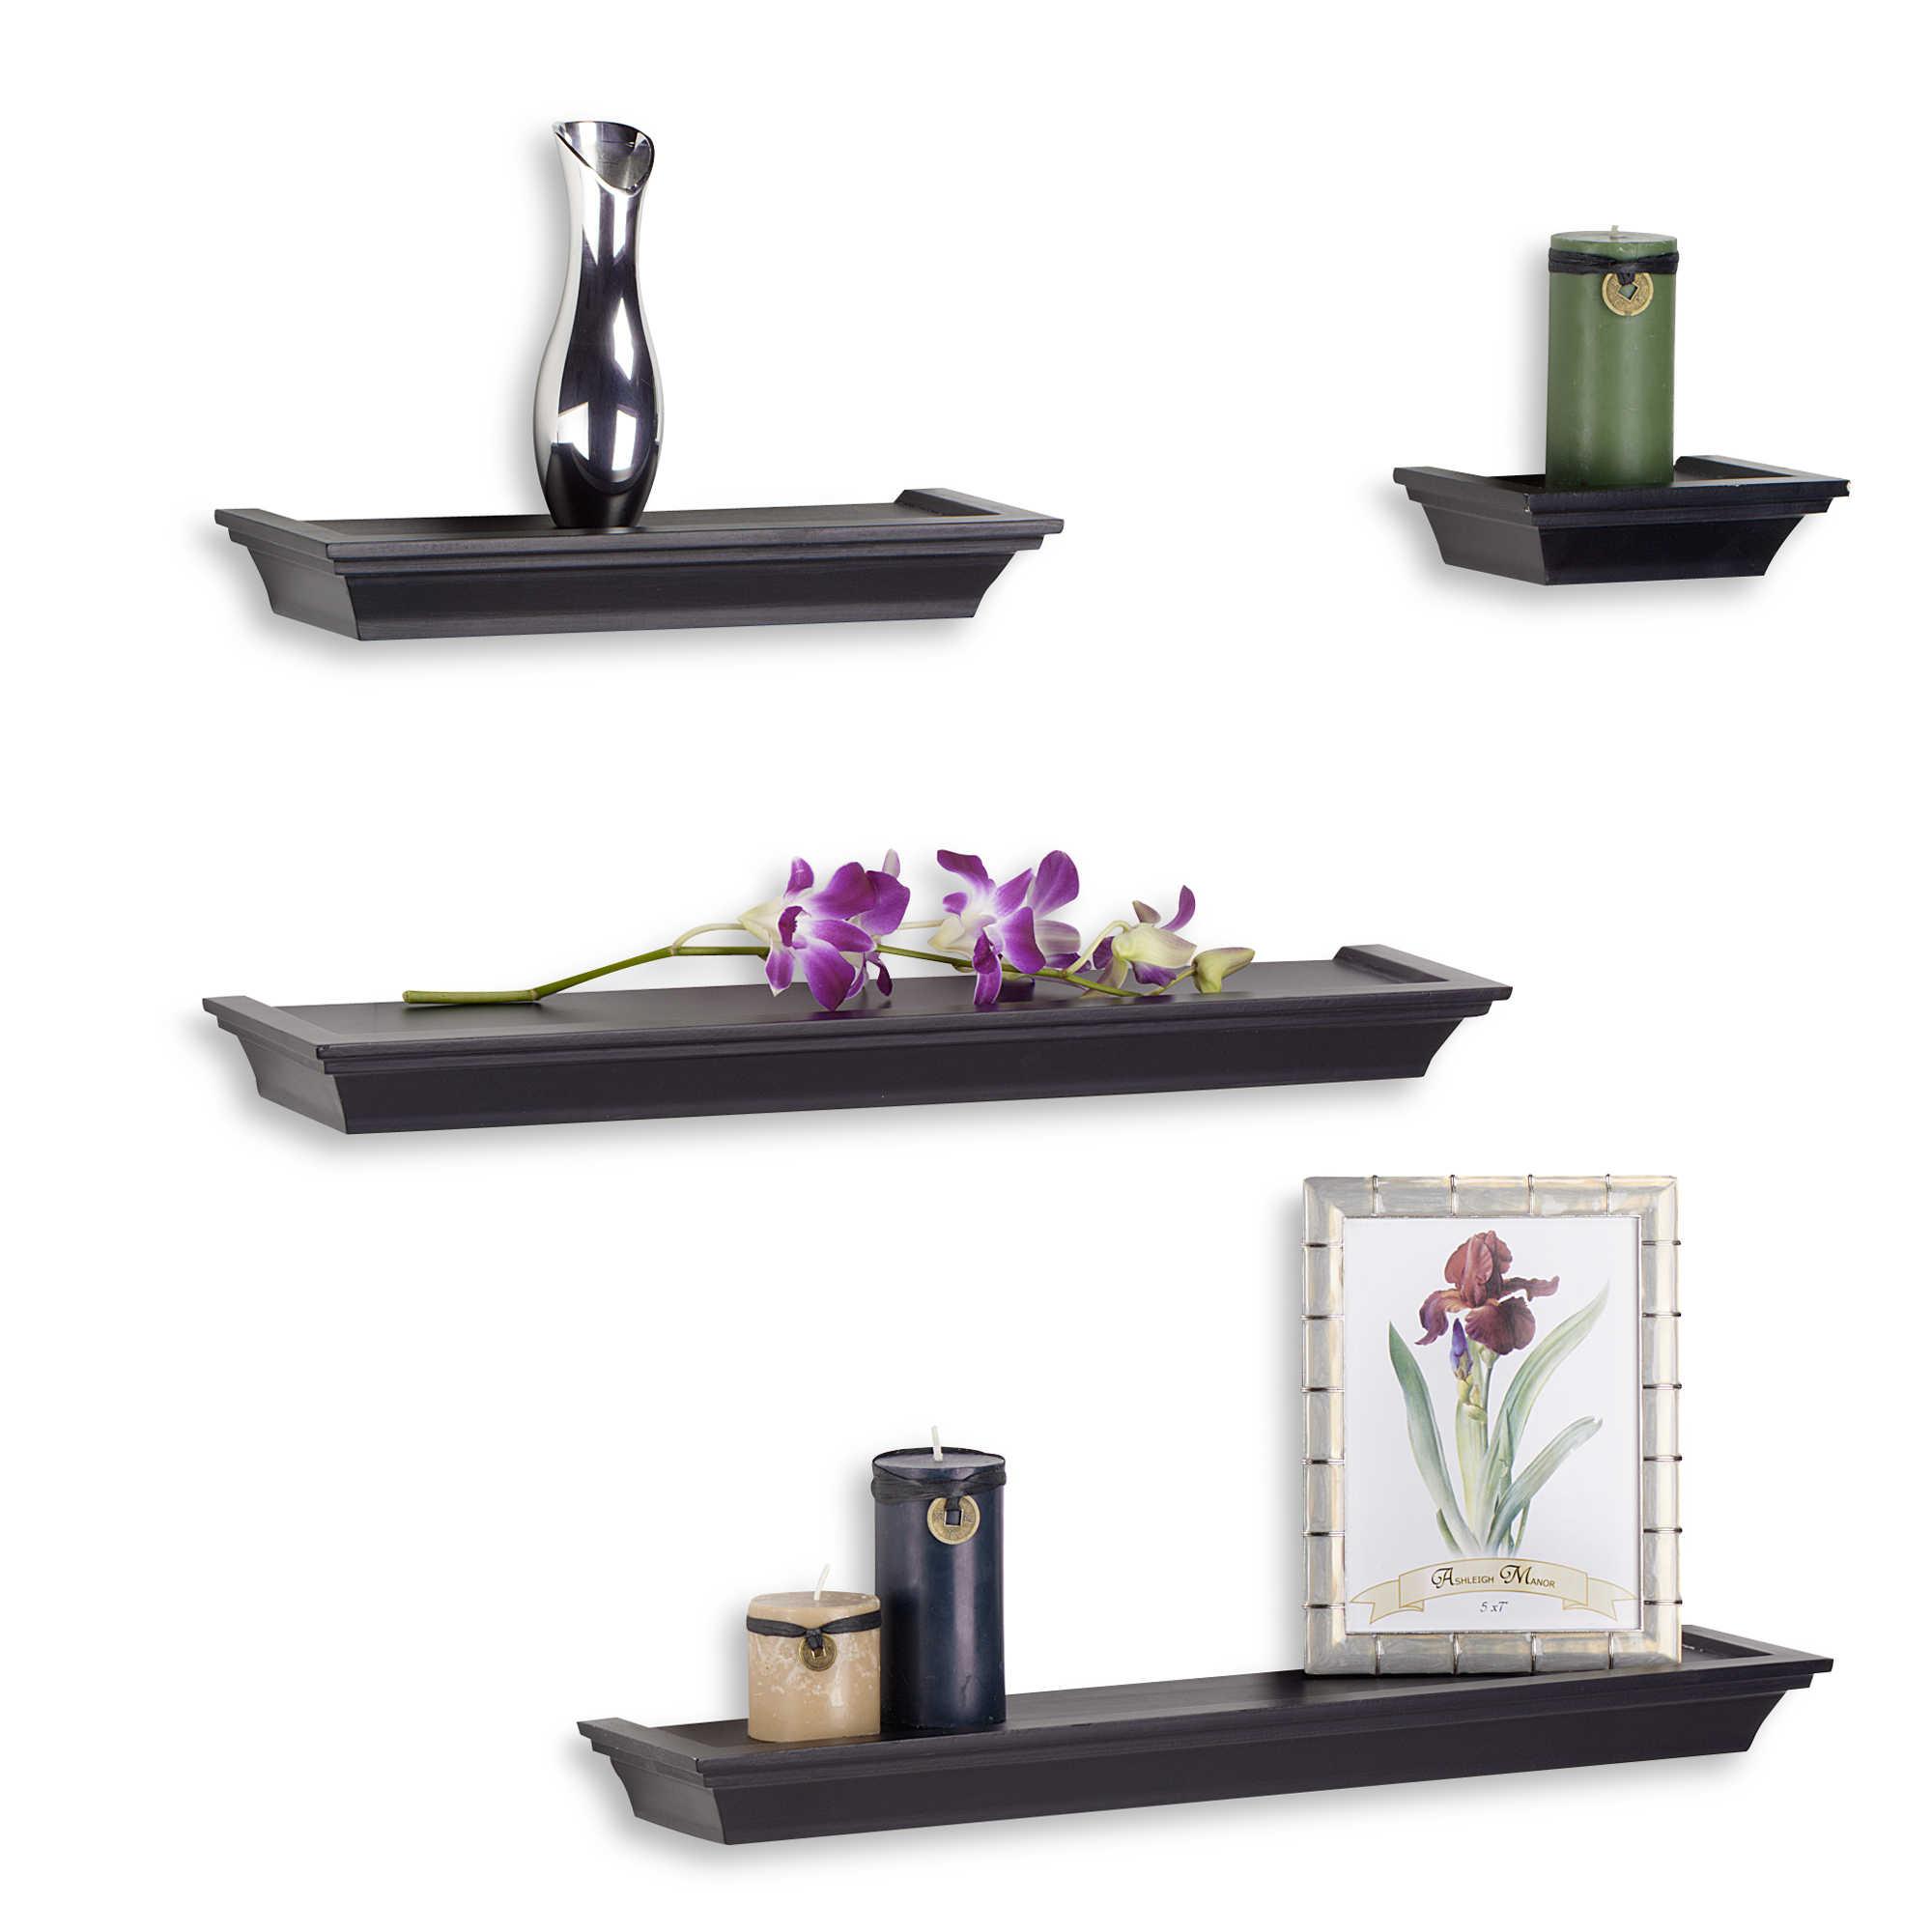 Design Decorative Shelves decorative wall shelves hooks corner bed bath beyond image of melannco 4 piece ledge set in black